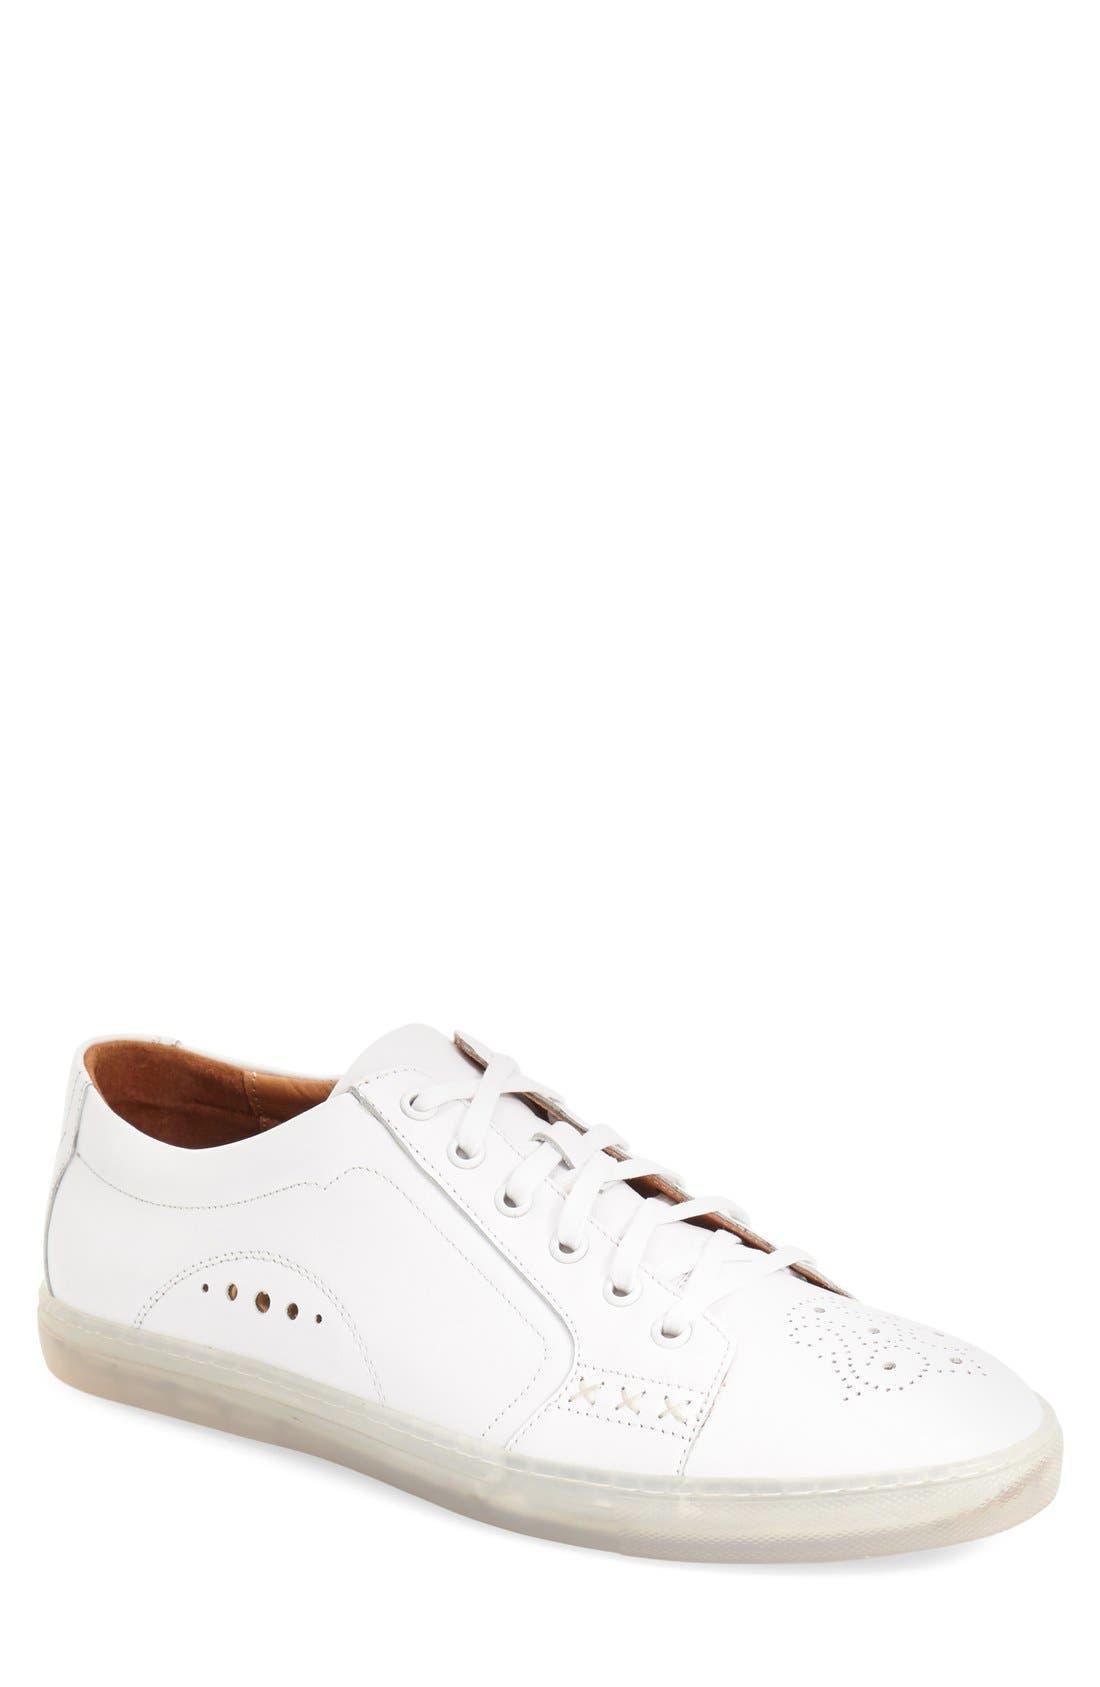 Alternate Image 1 Selected - Zanzara 'Drum' Lace-Up Sneaker (Men)